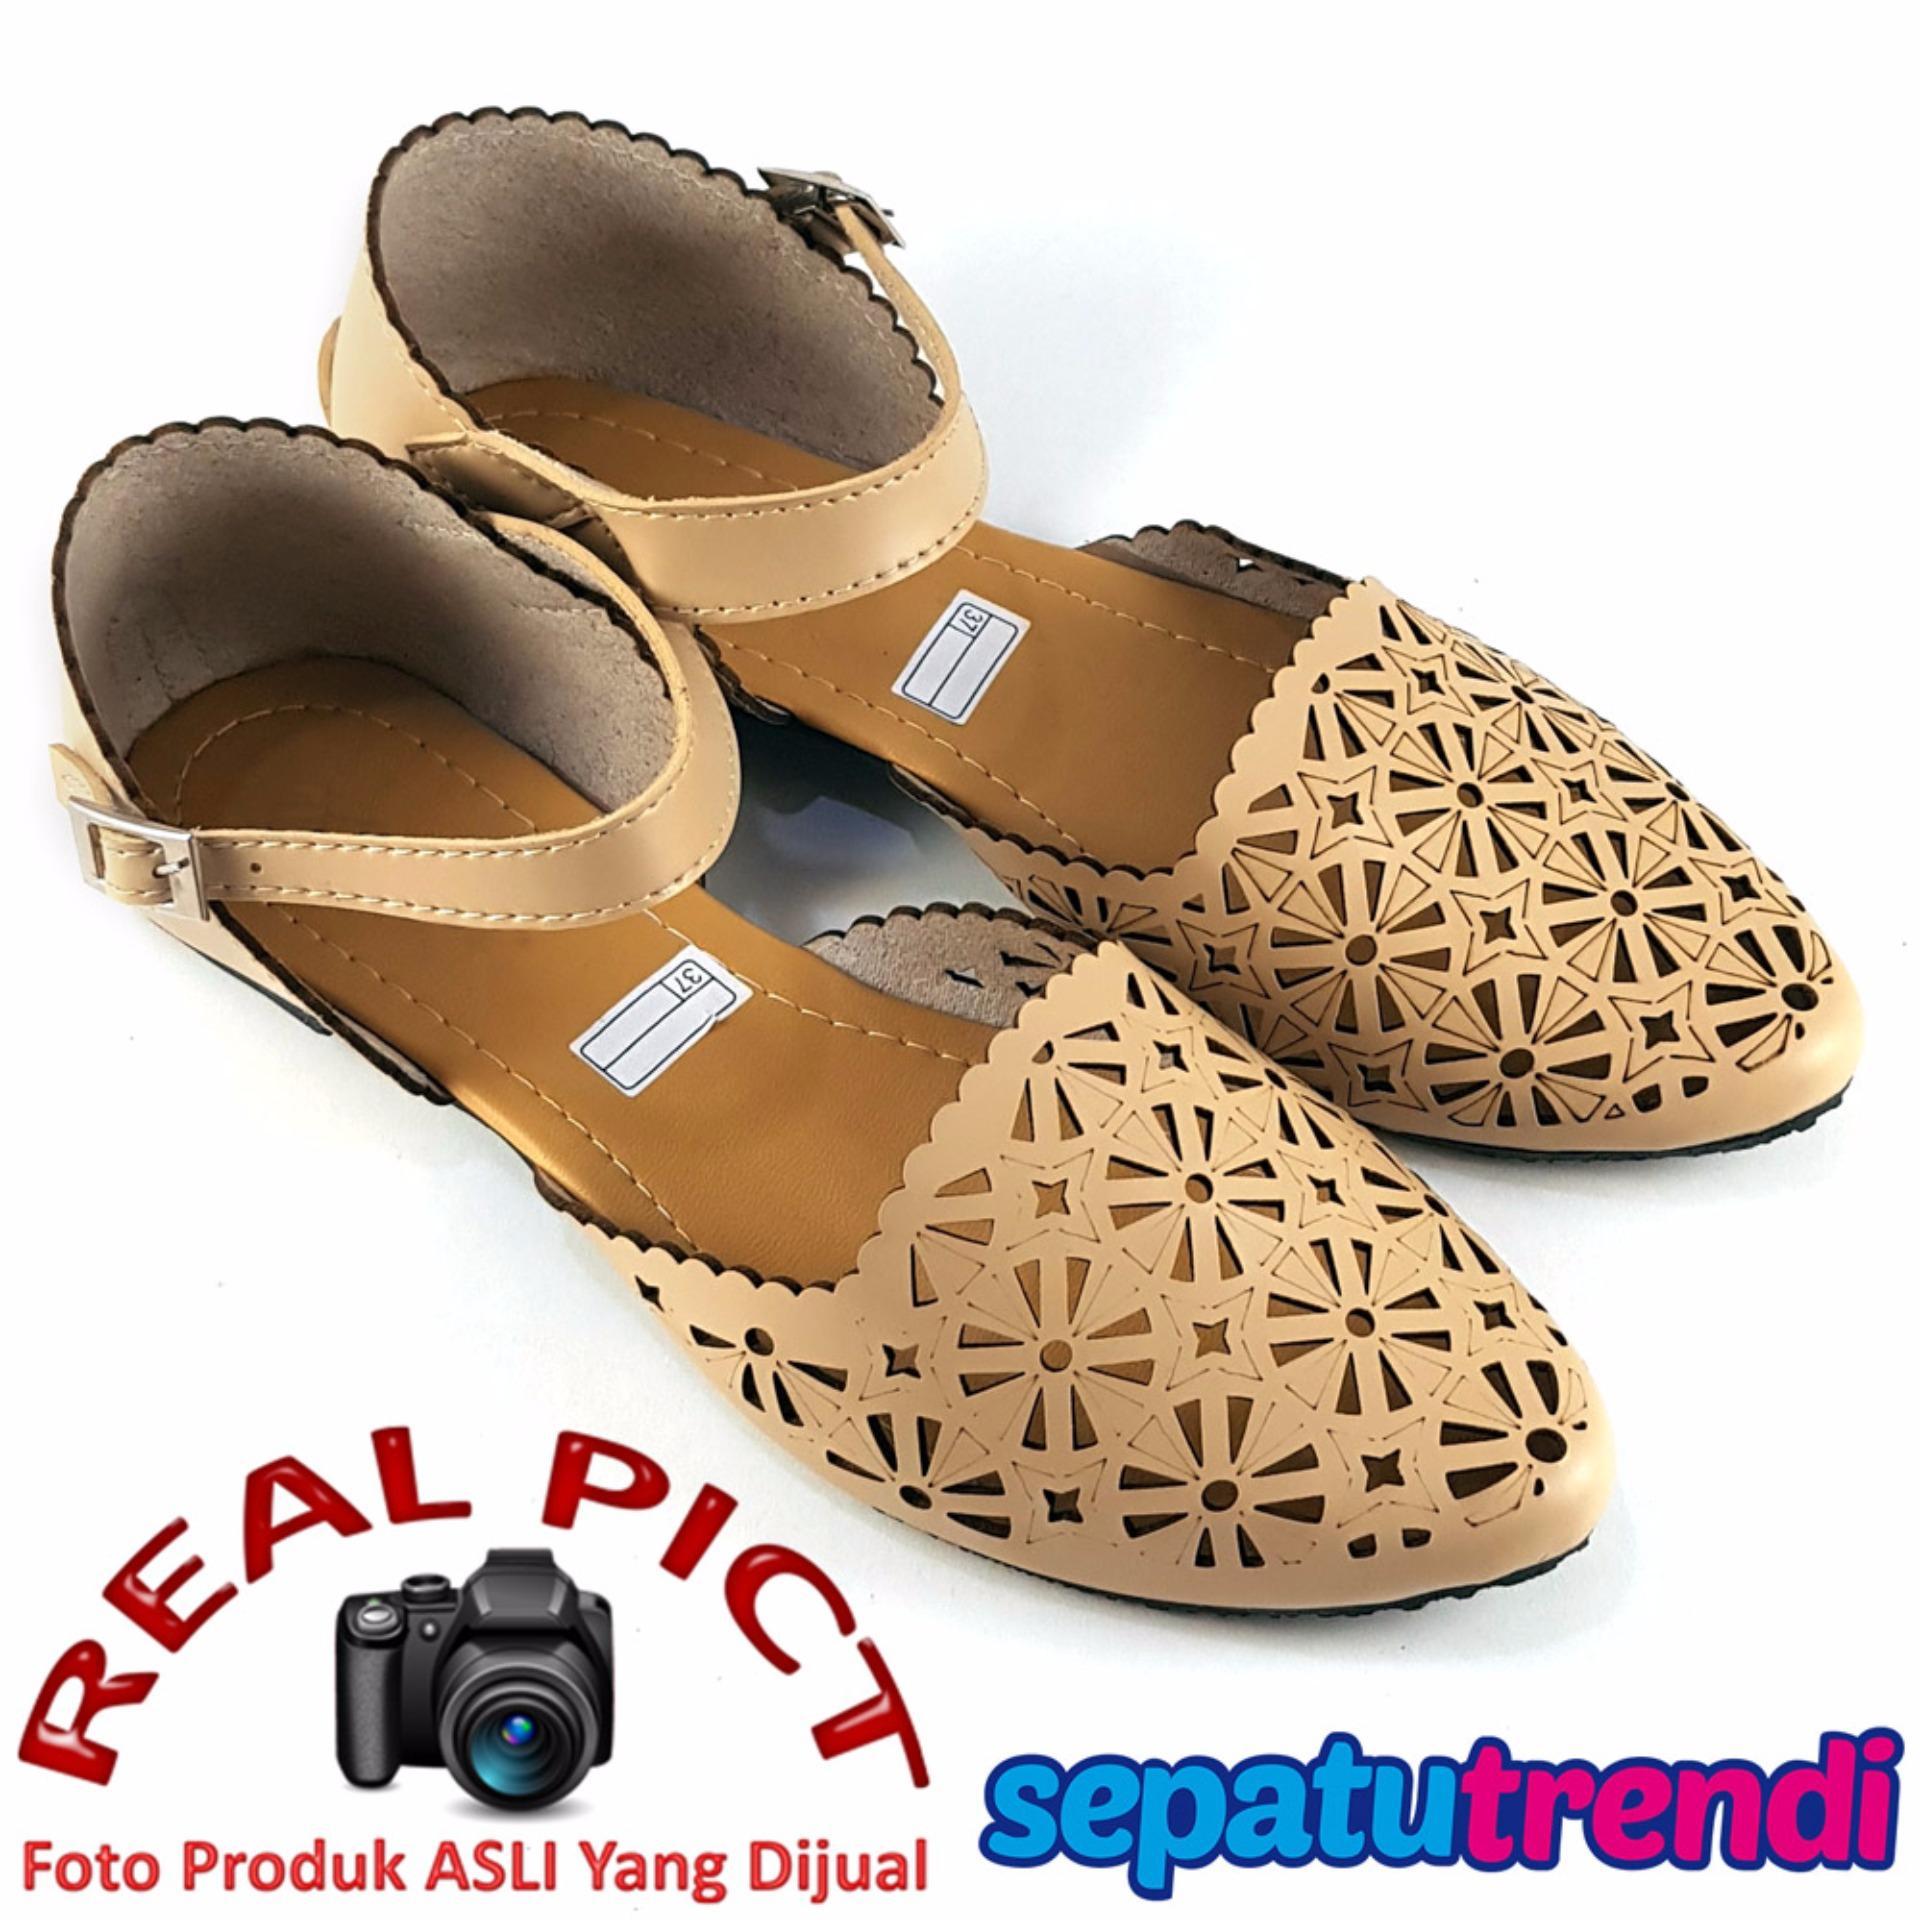 Lunetta Sepatu Flat Shoes Slip On Wanita Trans Laser Cut AR01IDR38270. Rp 38.270